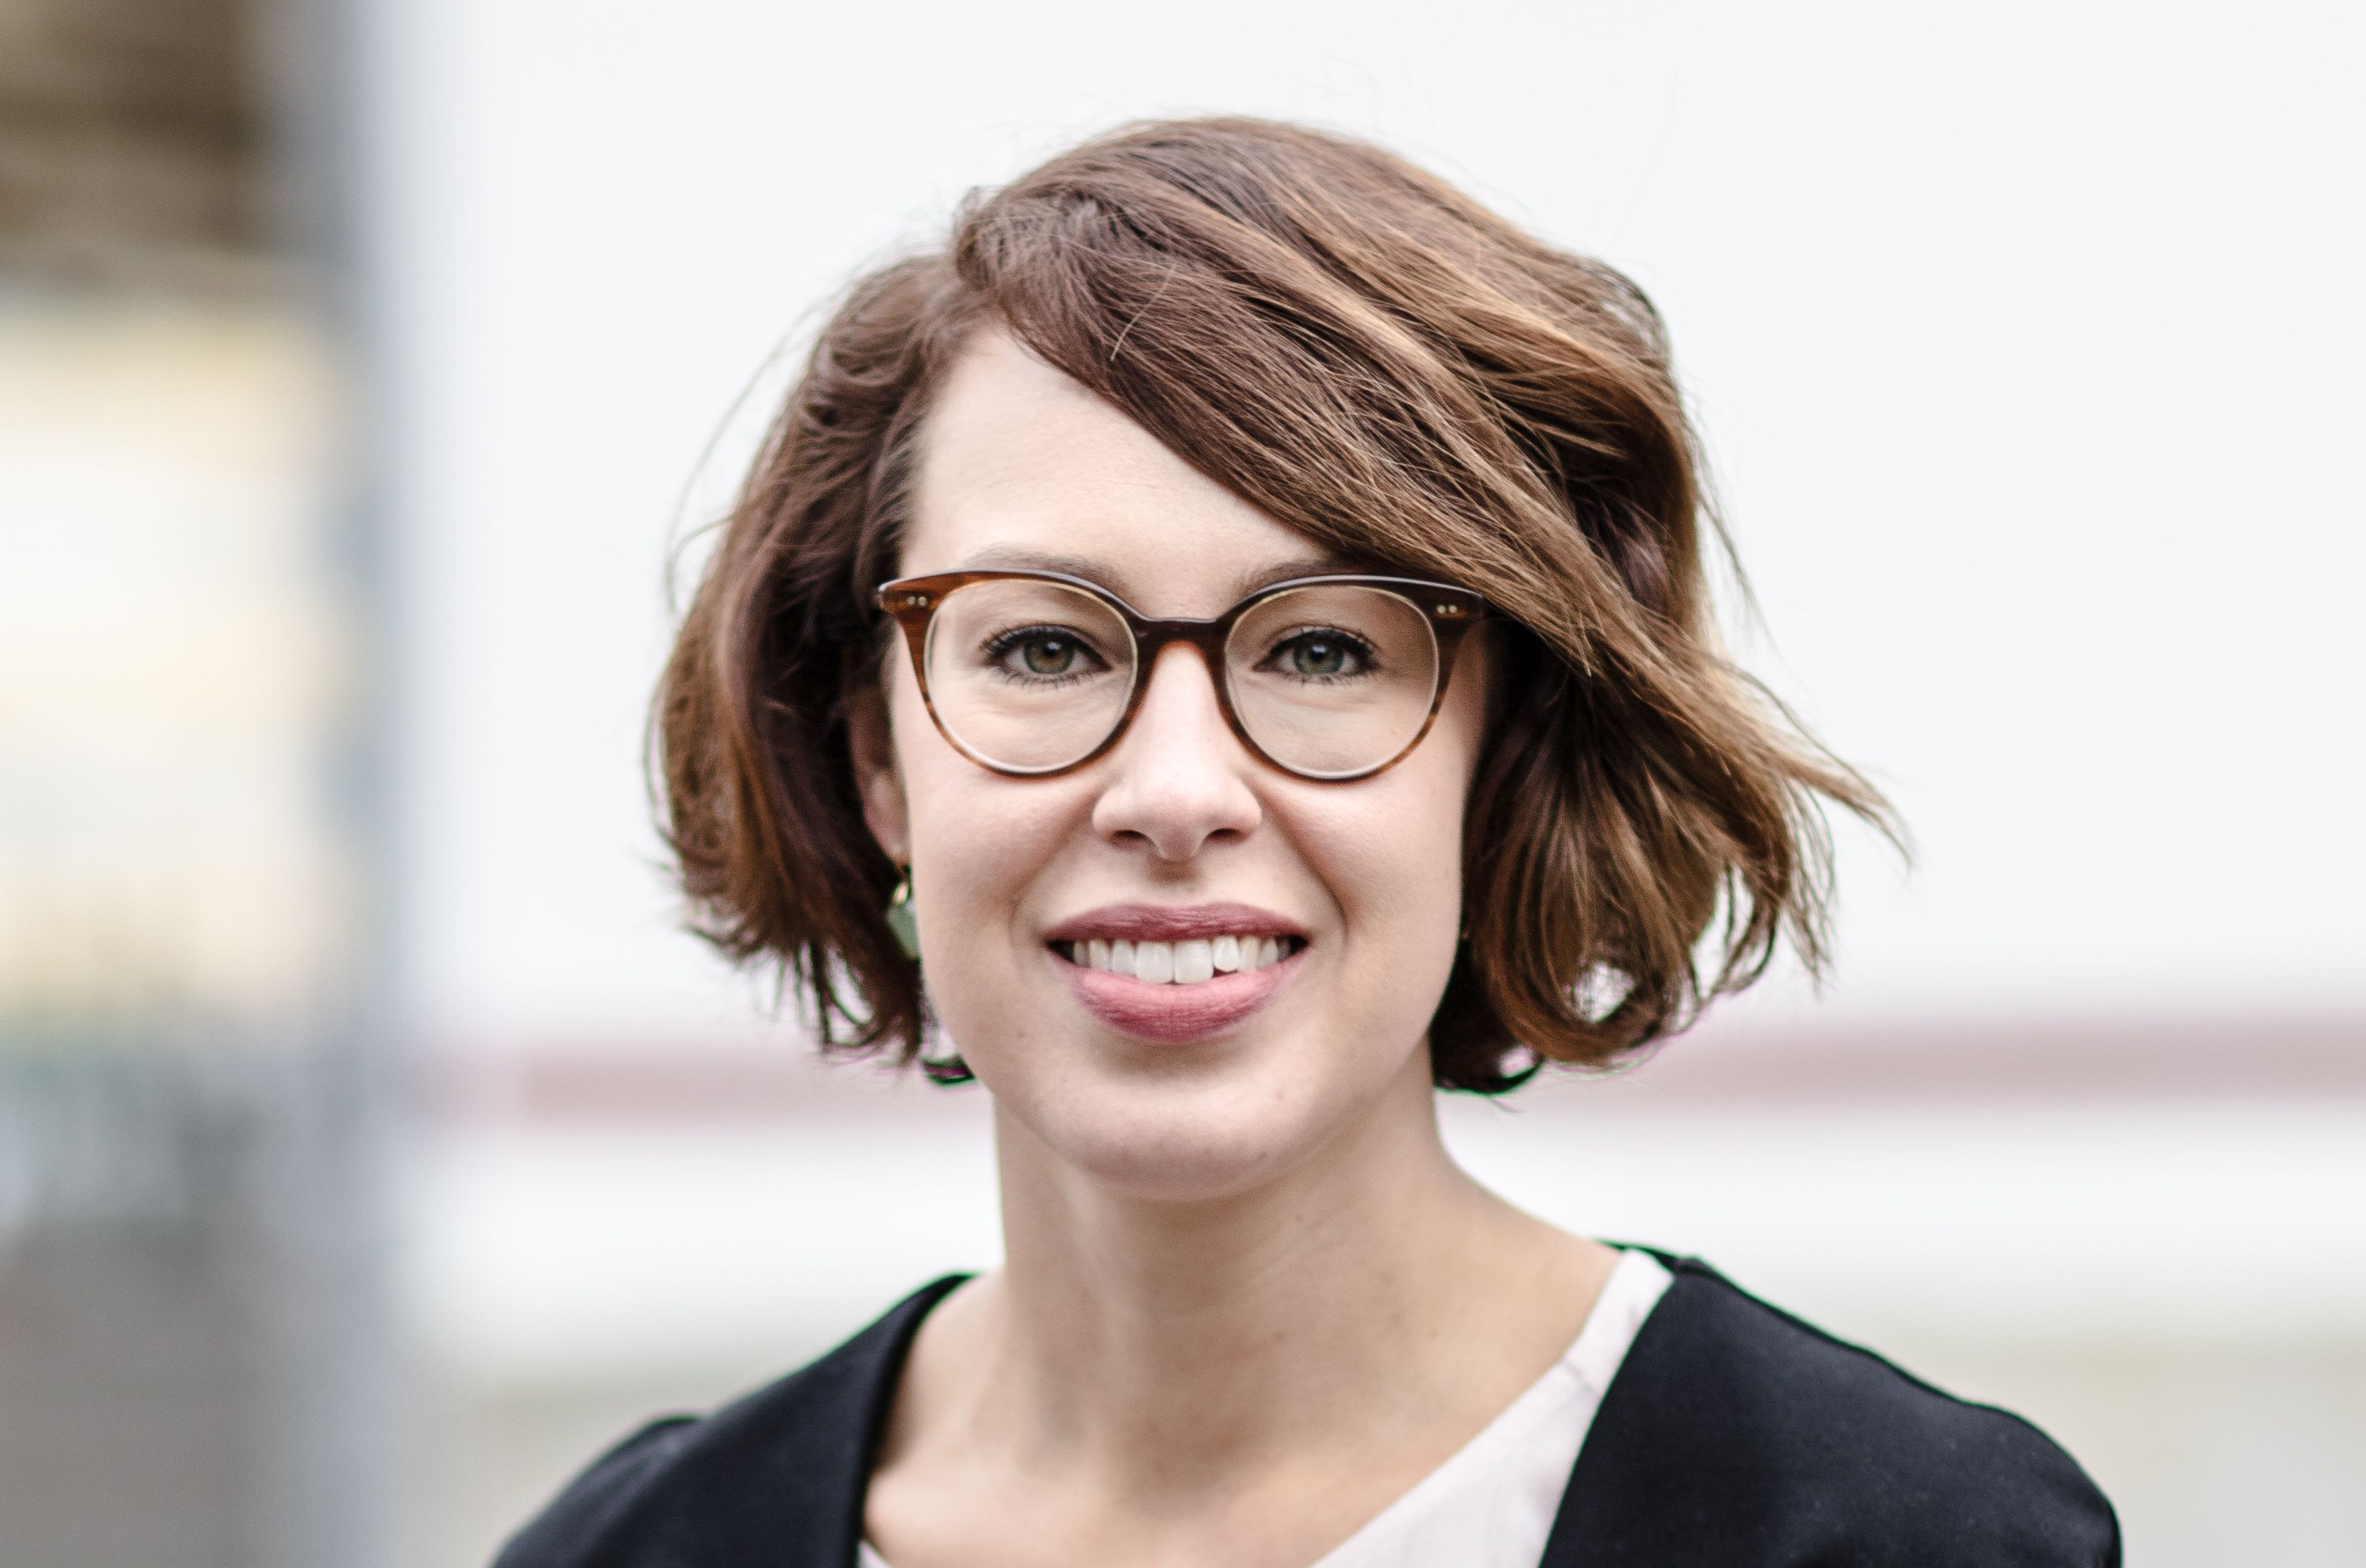 Livia lustenberger